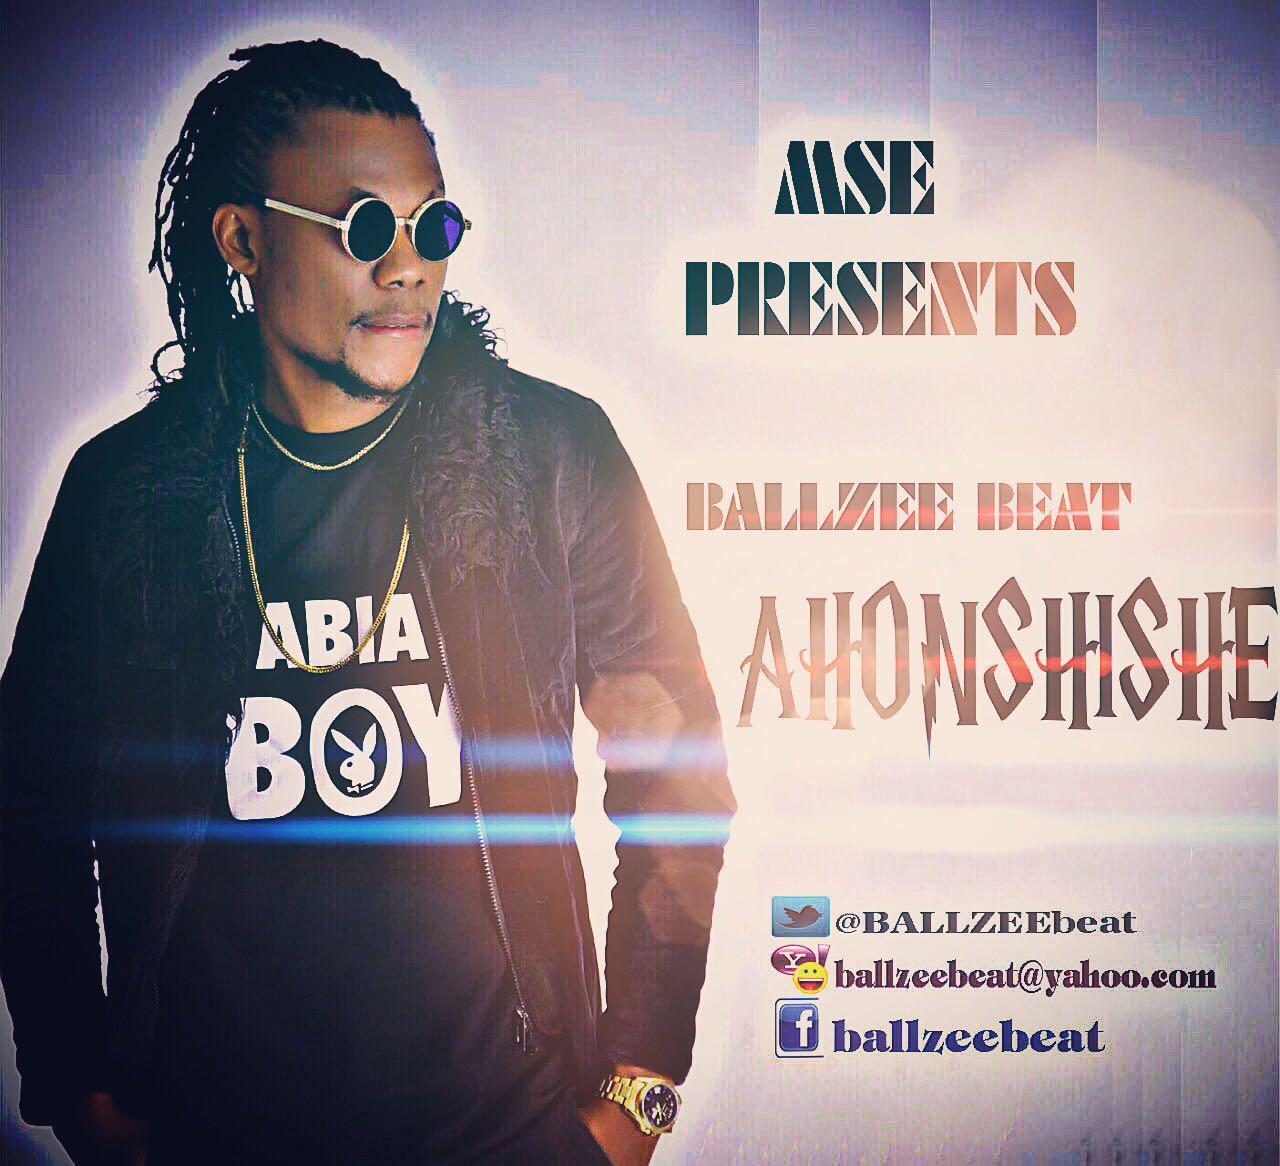 VIDEO: Ballzee Beat - Ahonshishe